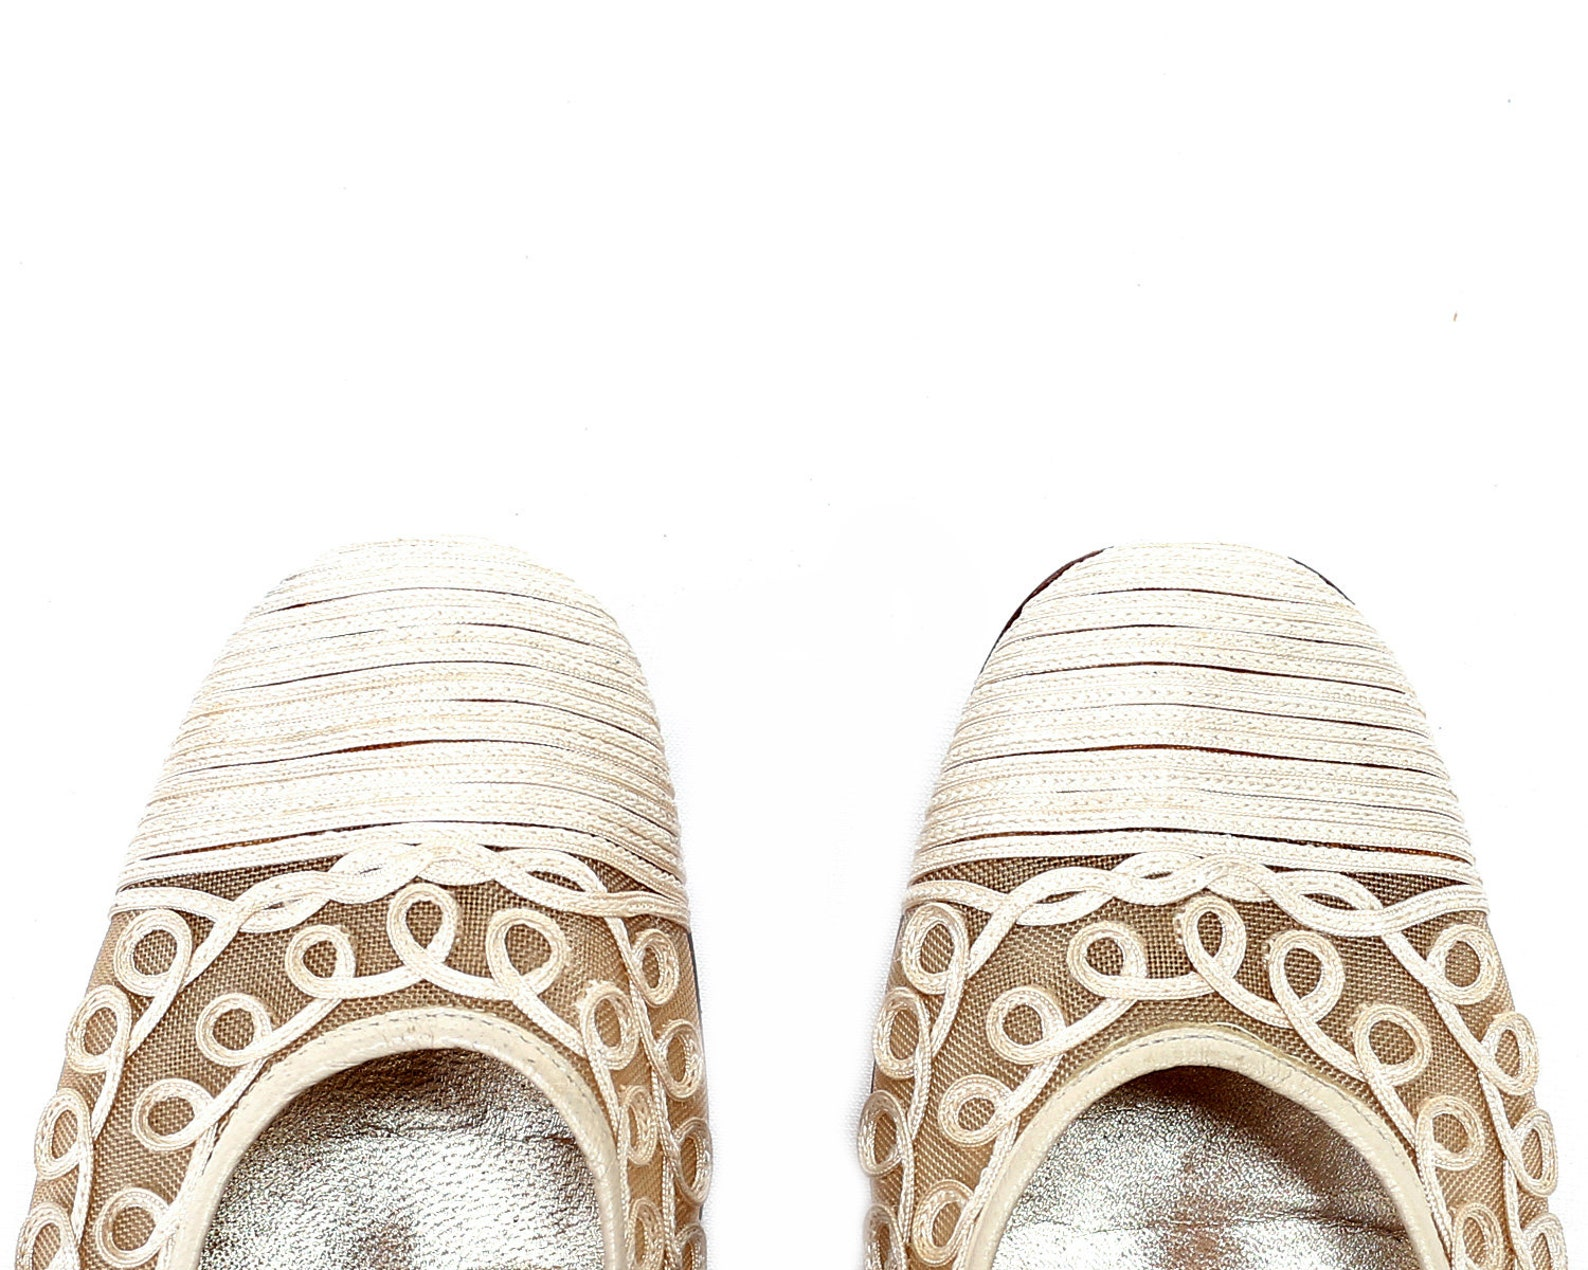 us size 6 sheer mesh ballet shoes 80s wedding ballerinas vintage ivory white flats low heel leather sole slip on flats eur 36 uk